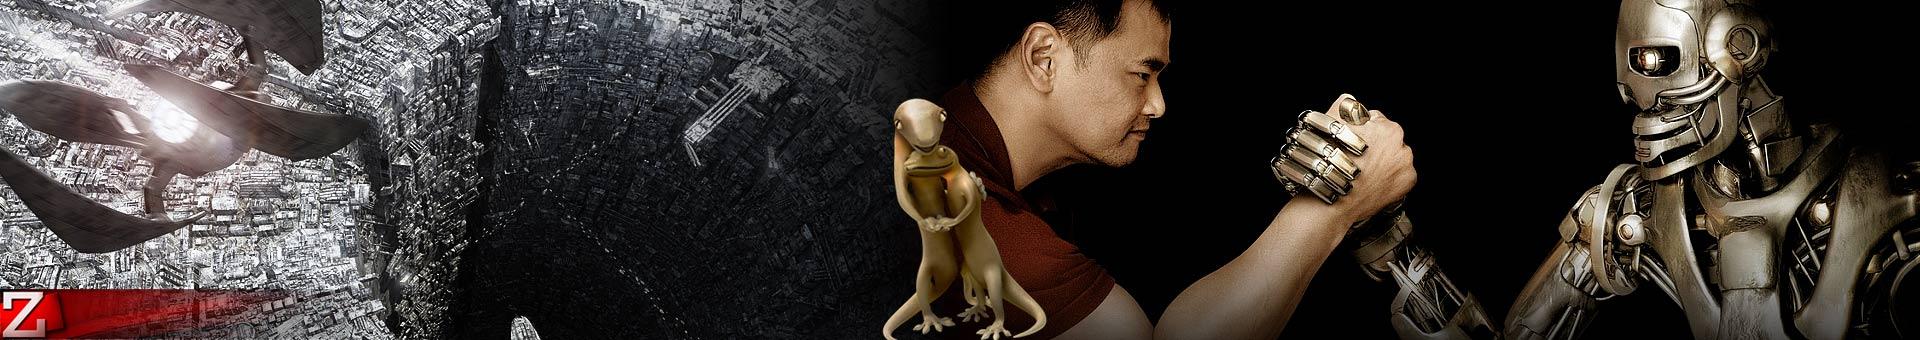 Ekarat Abhiratvorakul - Commercial Artist based in Bangkok